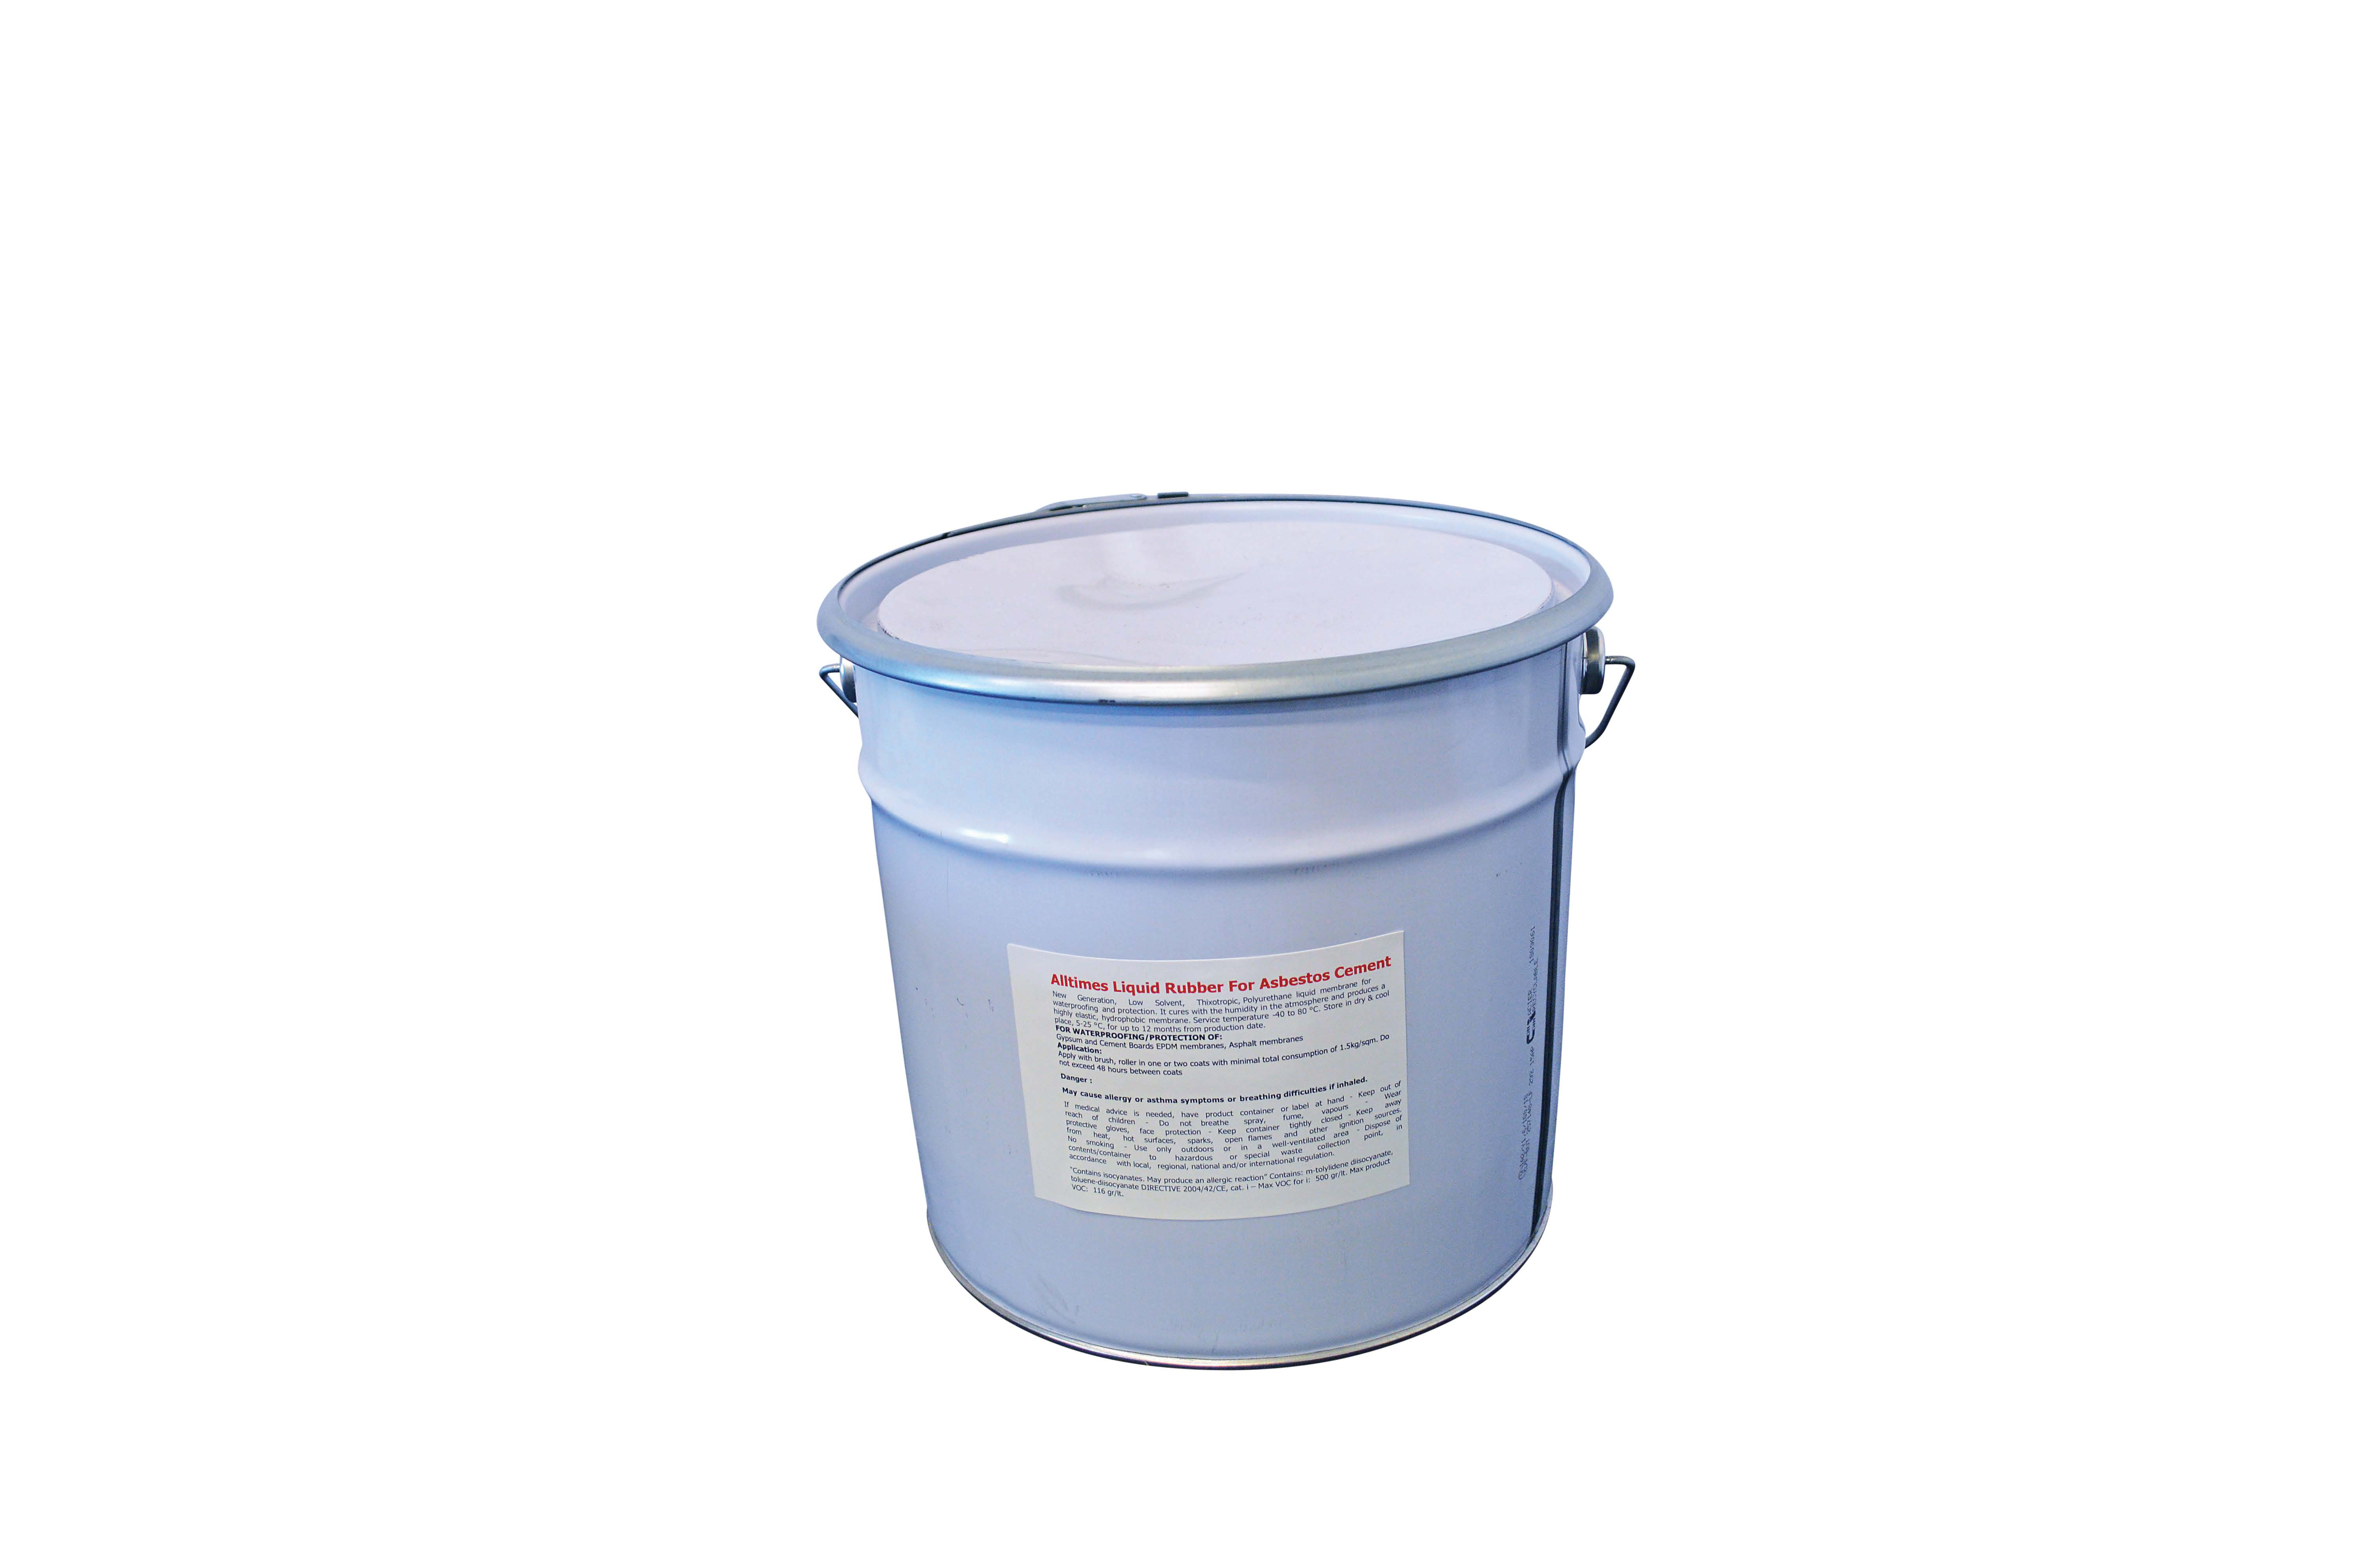 Alltimes Liquid Rubber Asbestos Roof Kits